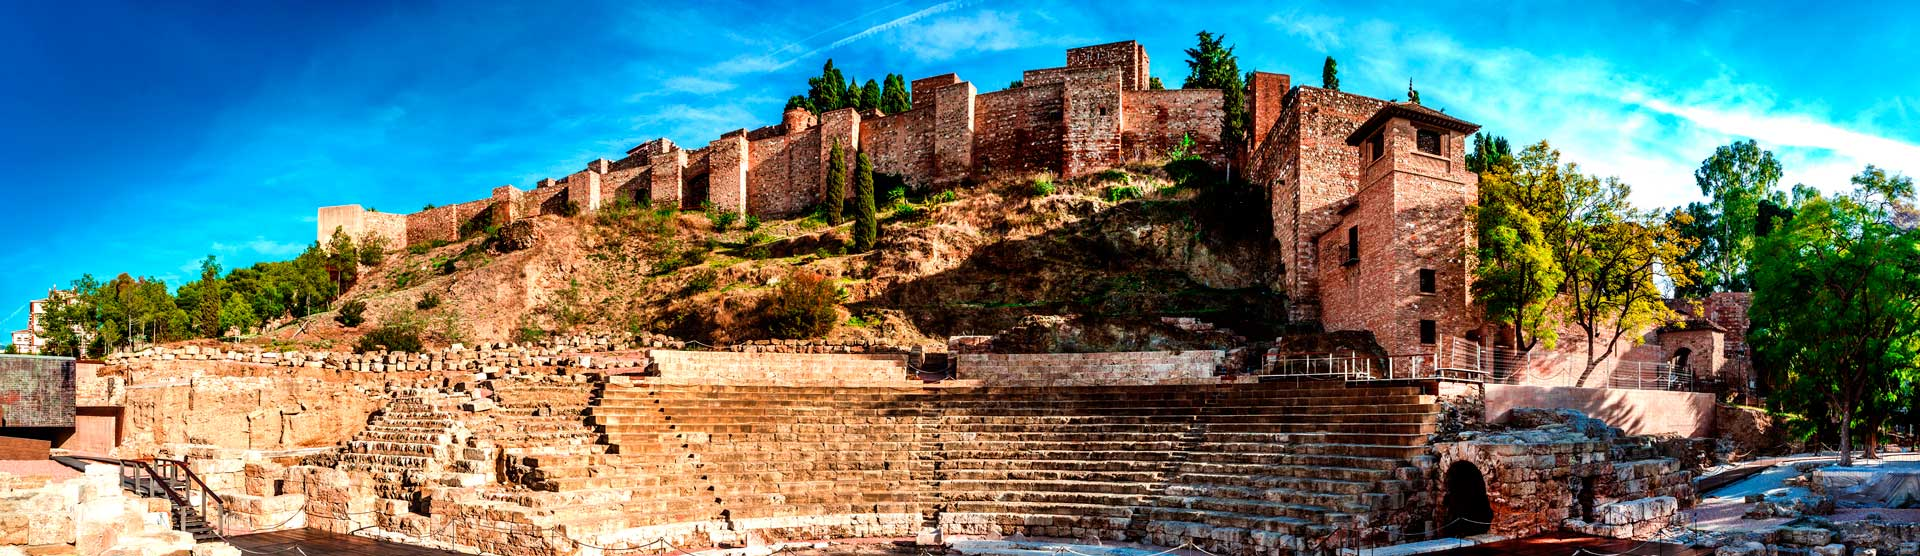 15 impresionantes lugares para visitar en Málaga.